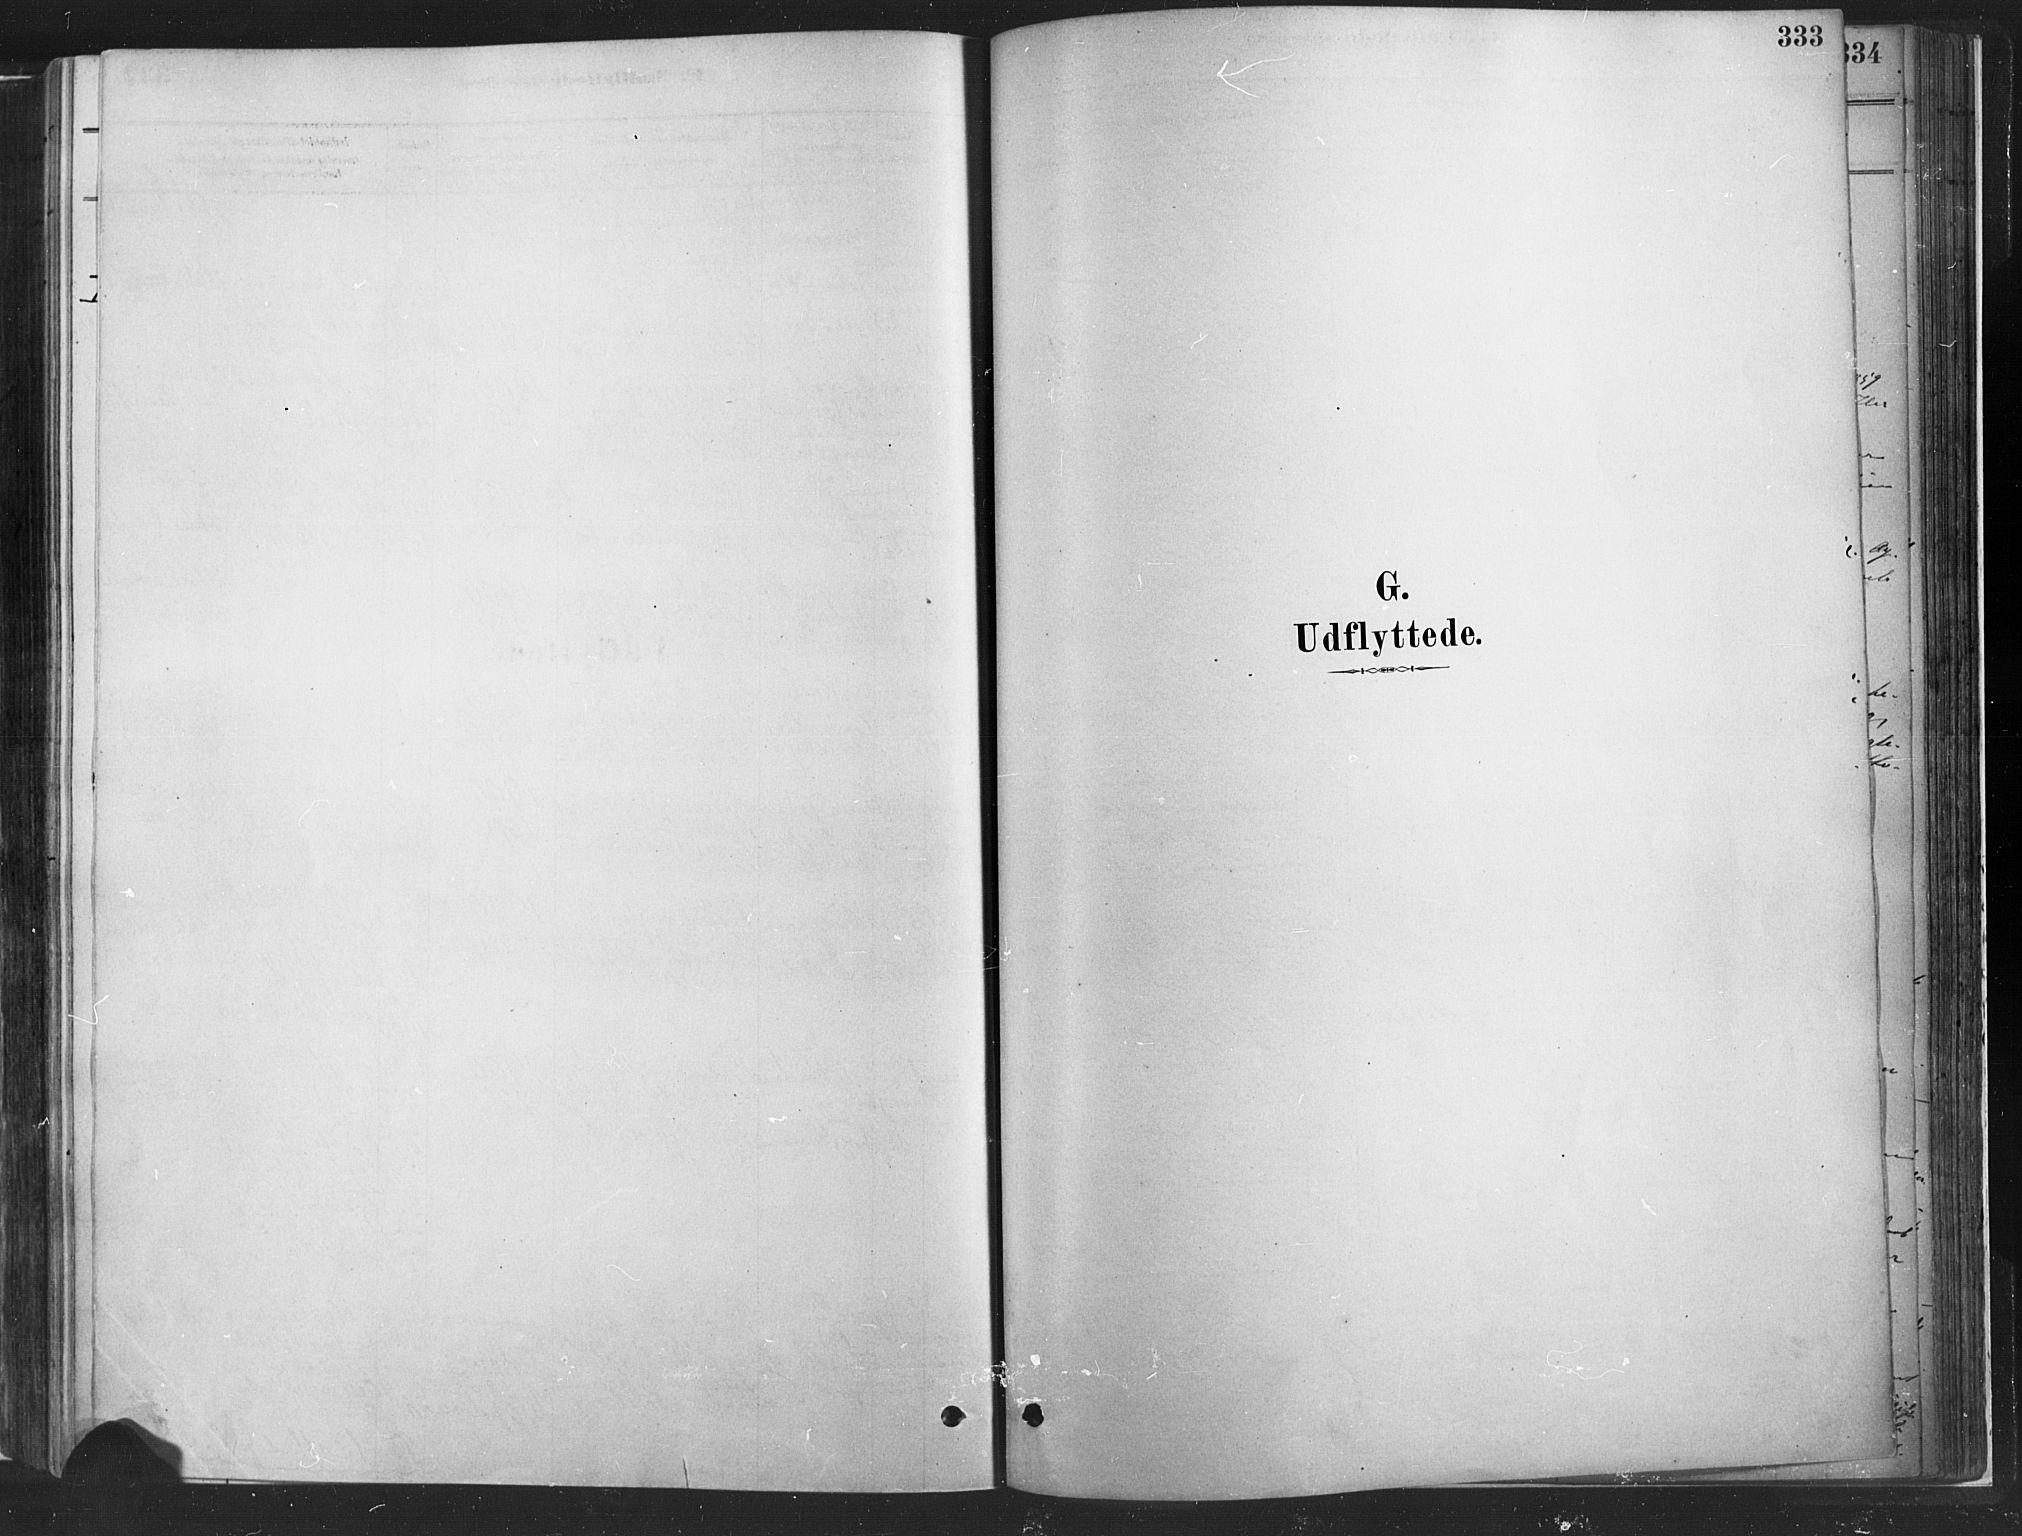 SAH, Fåberg prestekontor, Ministerialbok nr. 10, 1879-1900, s. 333